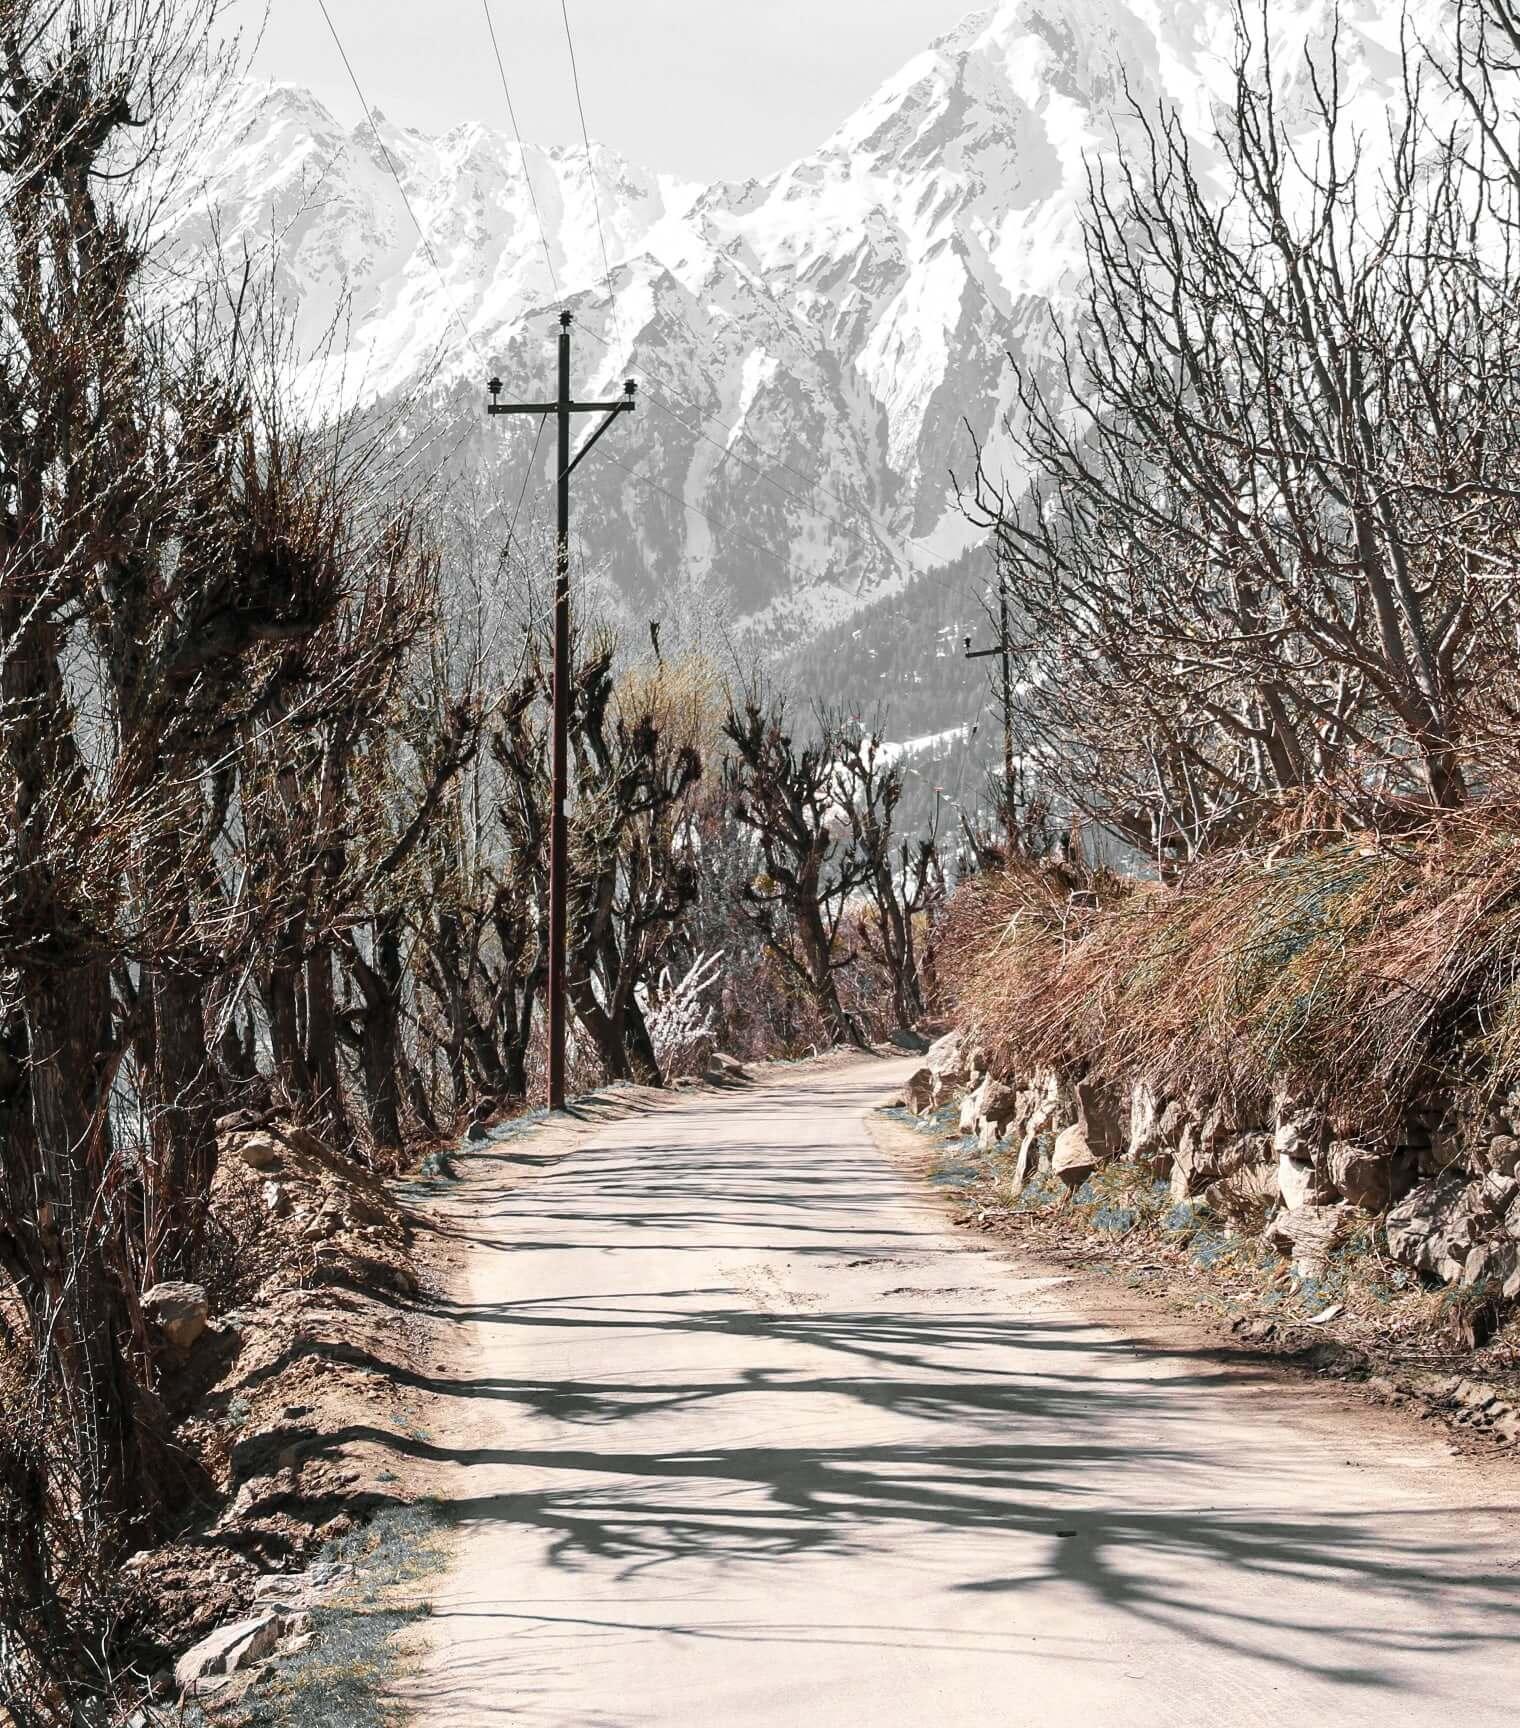 Kalpa - Towards village Kashmir